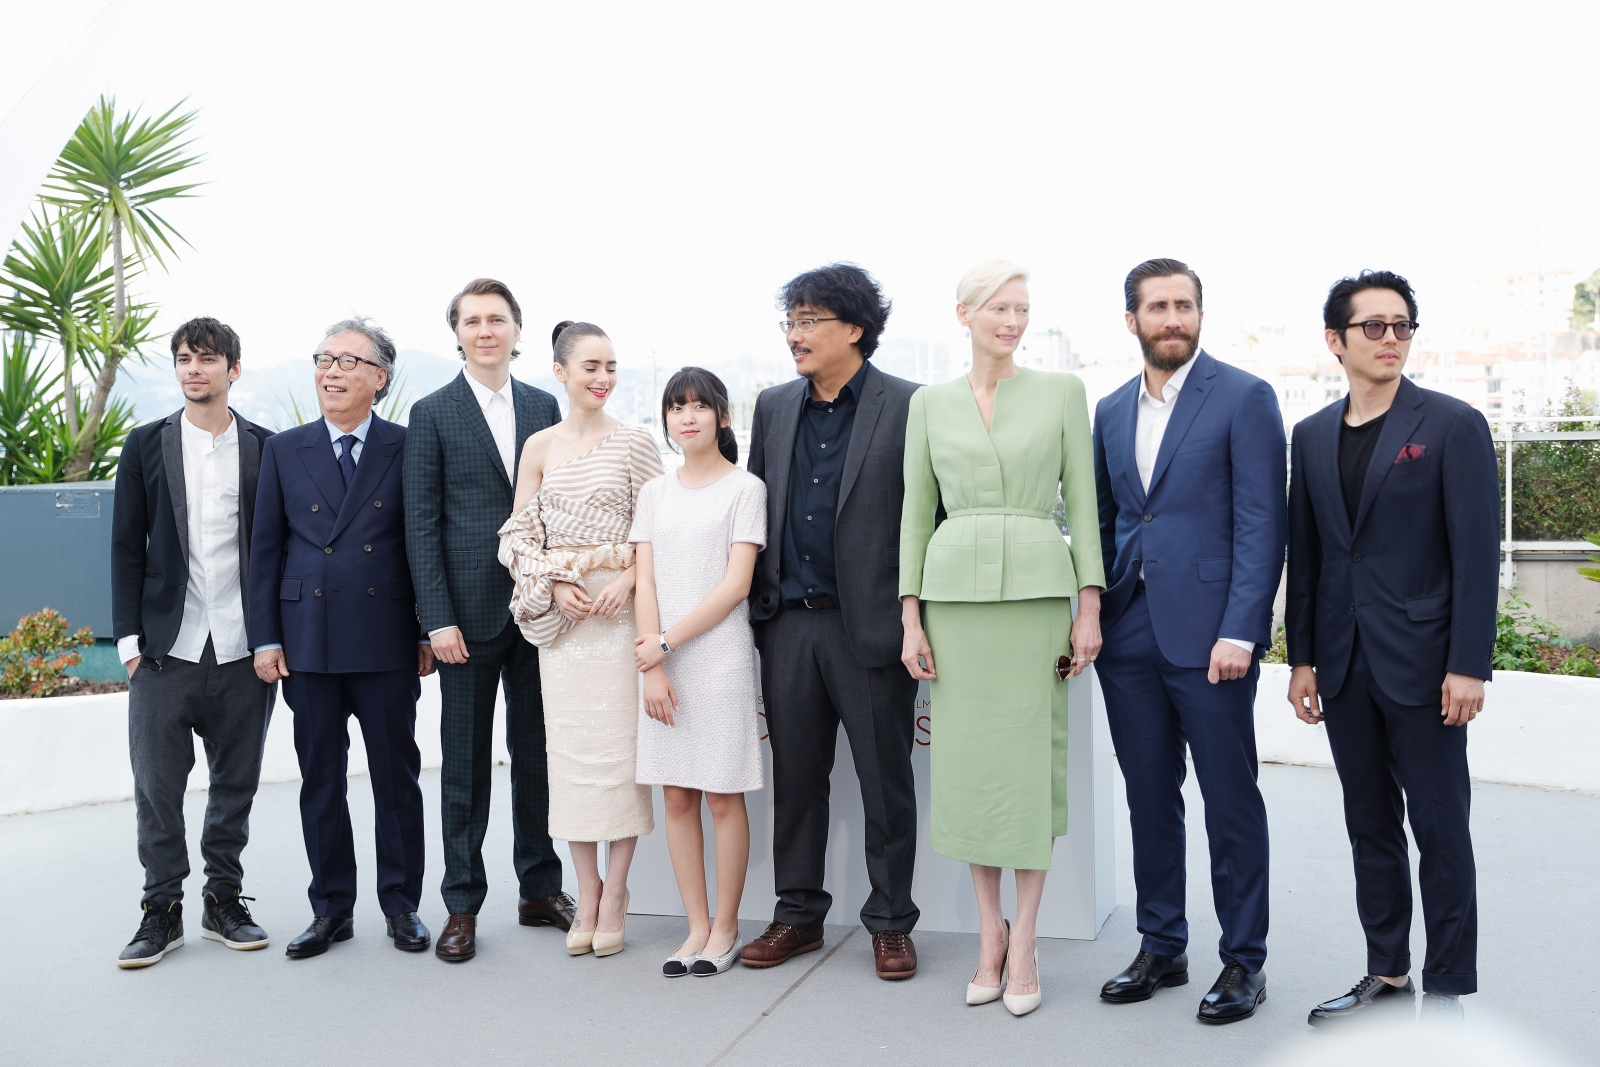 Okja premiere at Cannes Film Festival